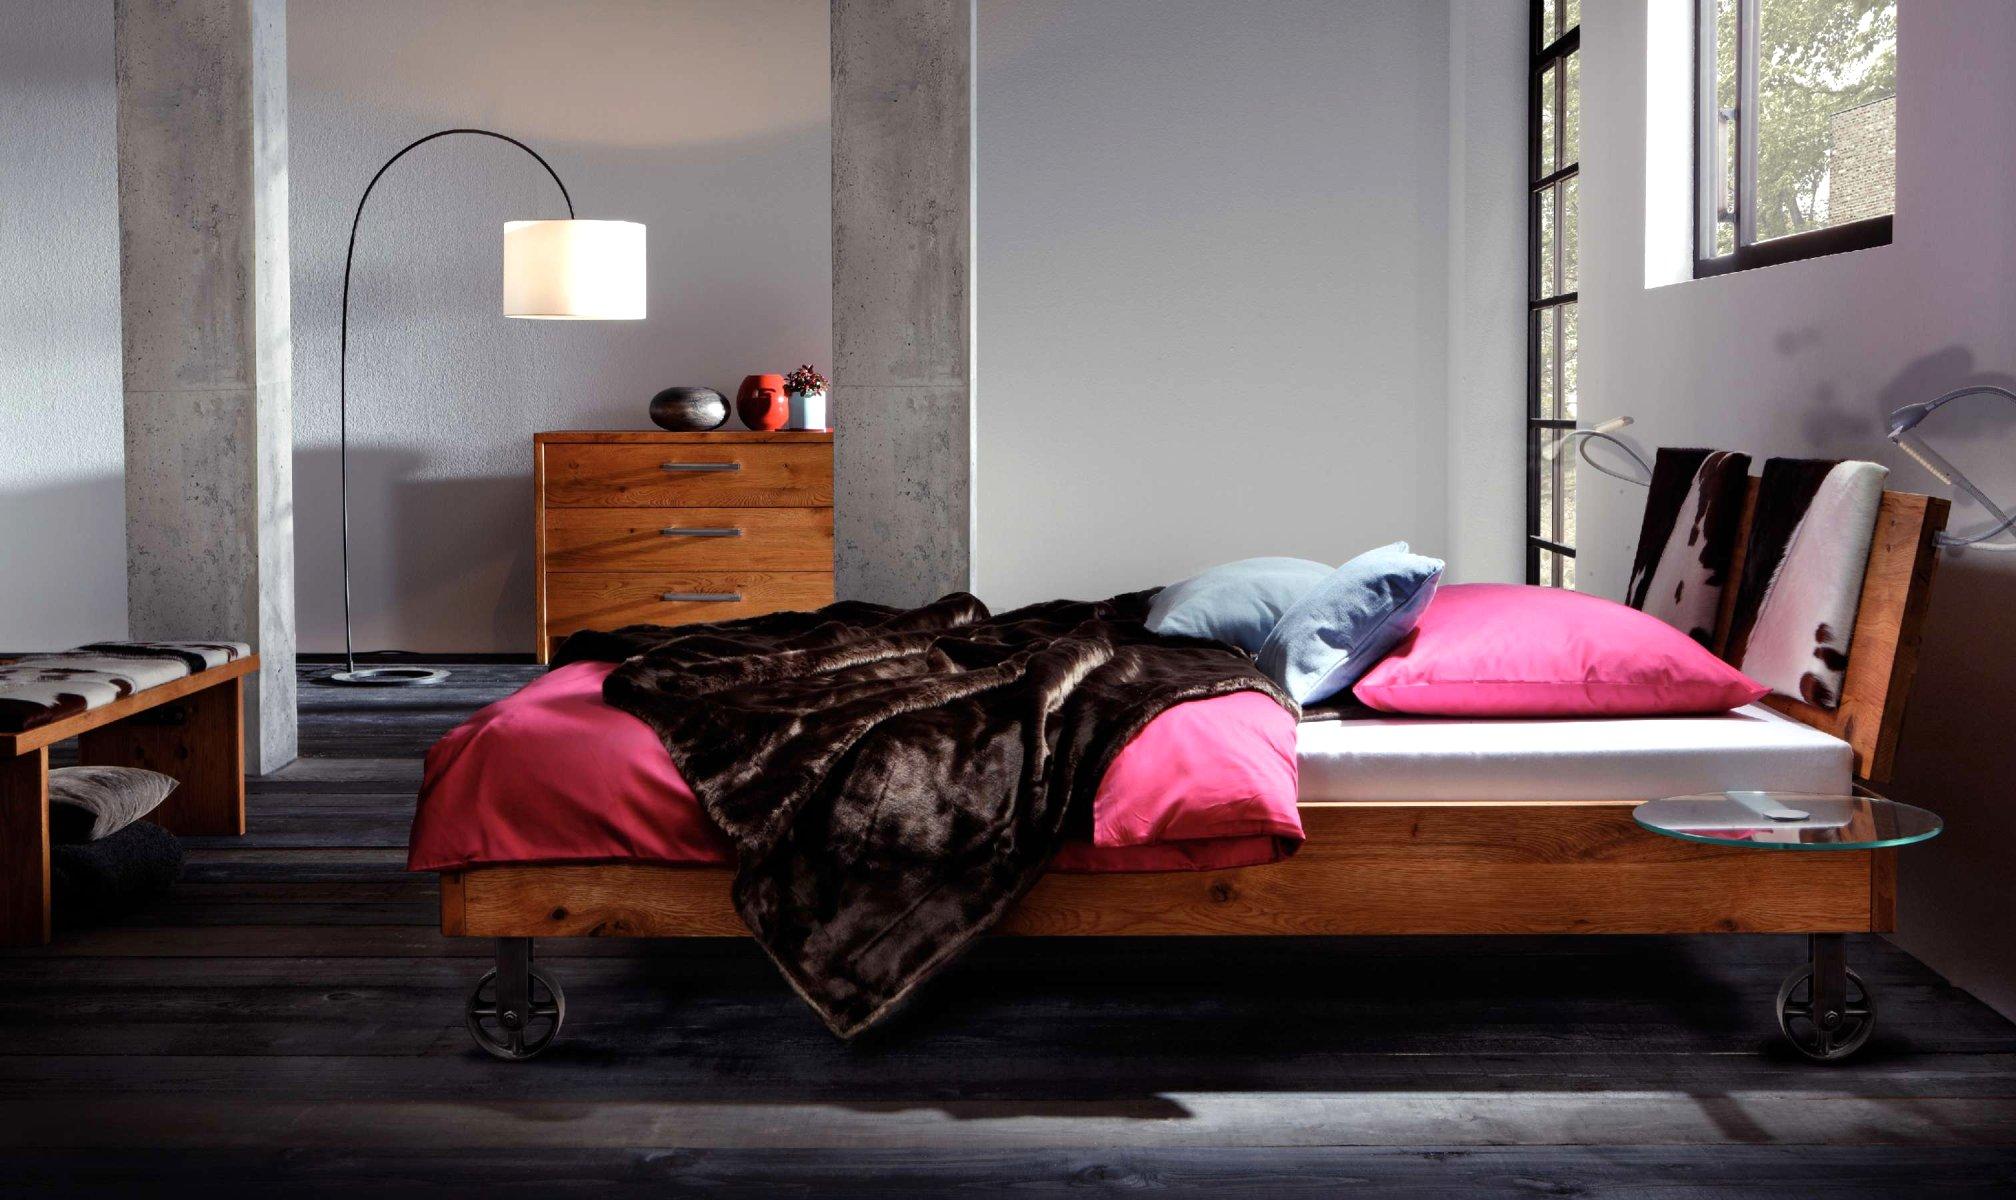 wasserbett komplett oakline wild pilatus 23 mit sion kopfteil inkl grado f e. Black Bedroom Furniture Sets. Home Design Ideas